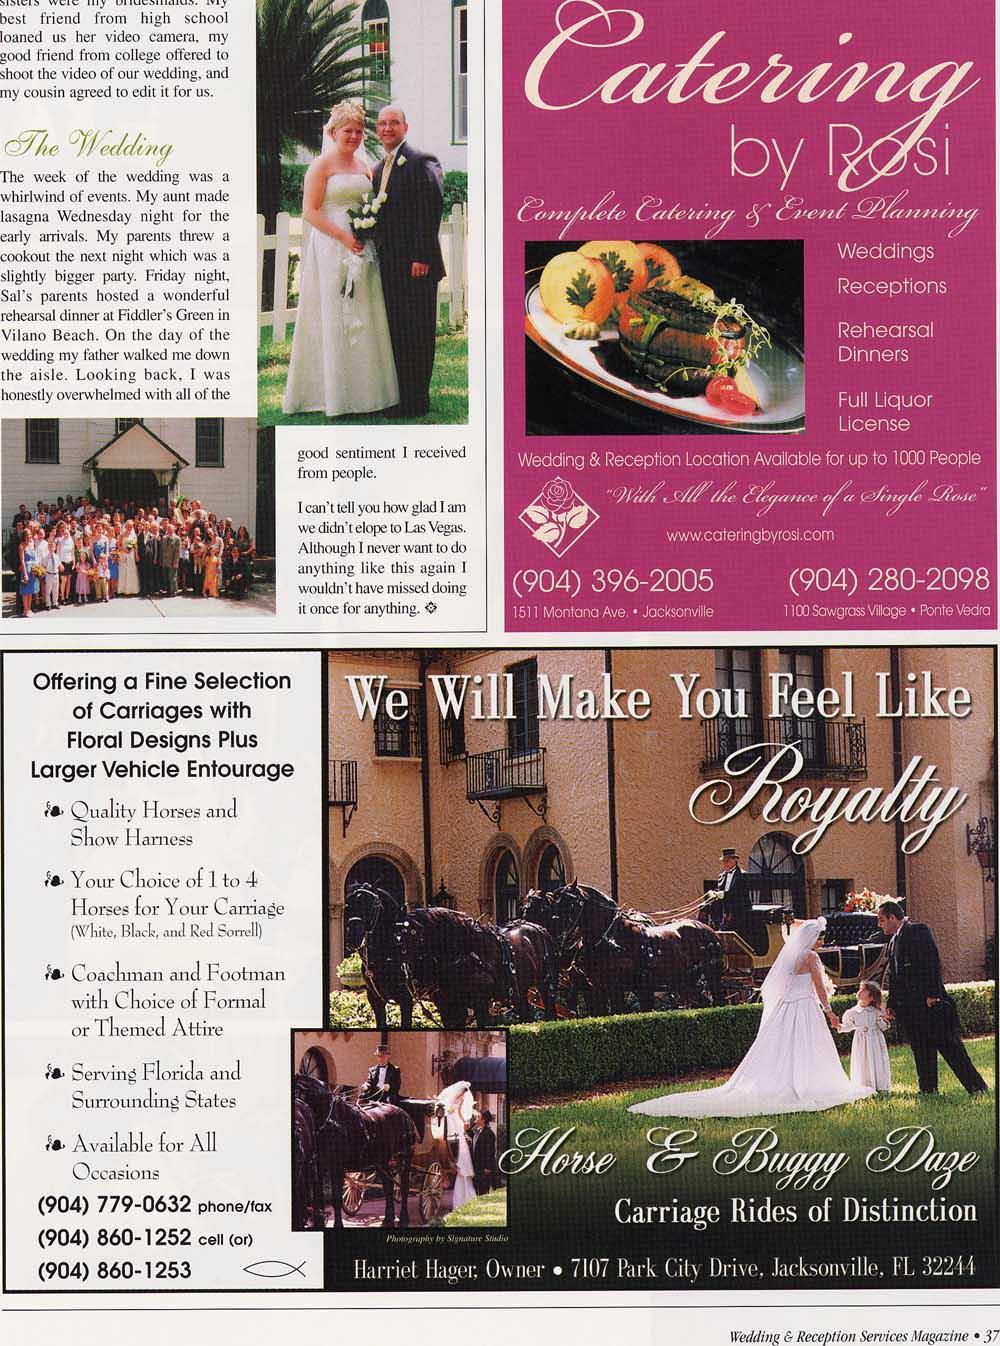 Rick-Ferro-Bridal-Magazine-Ad.jpg